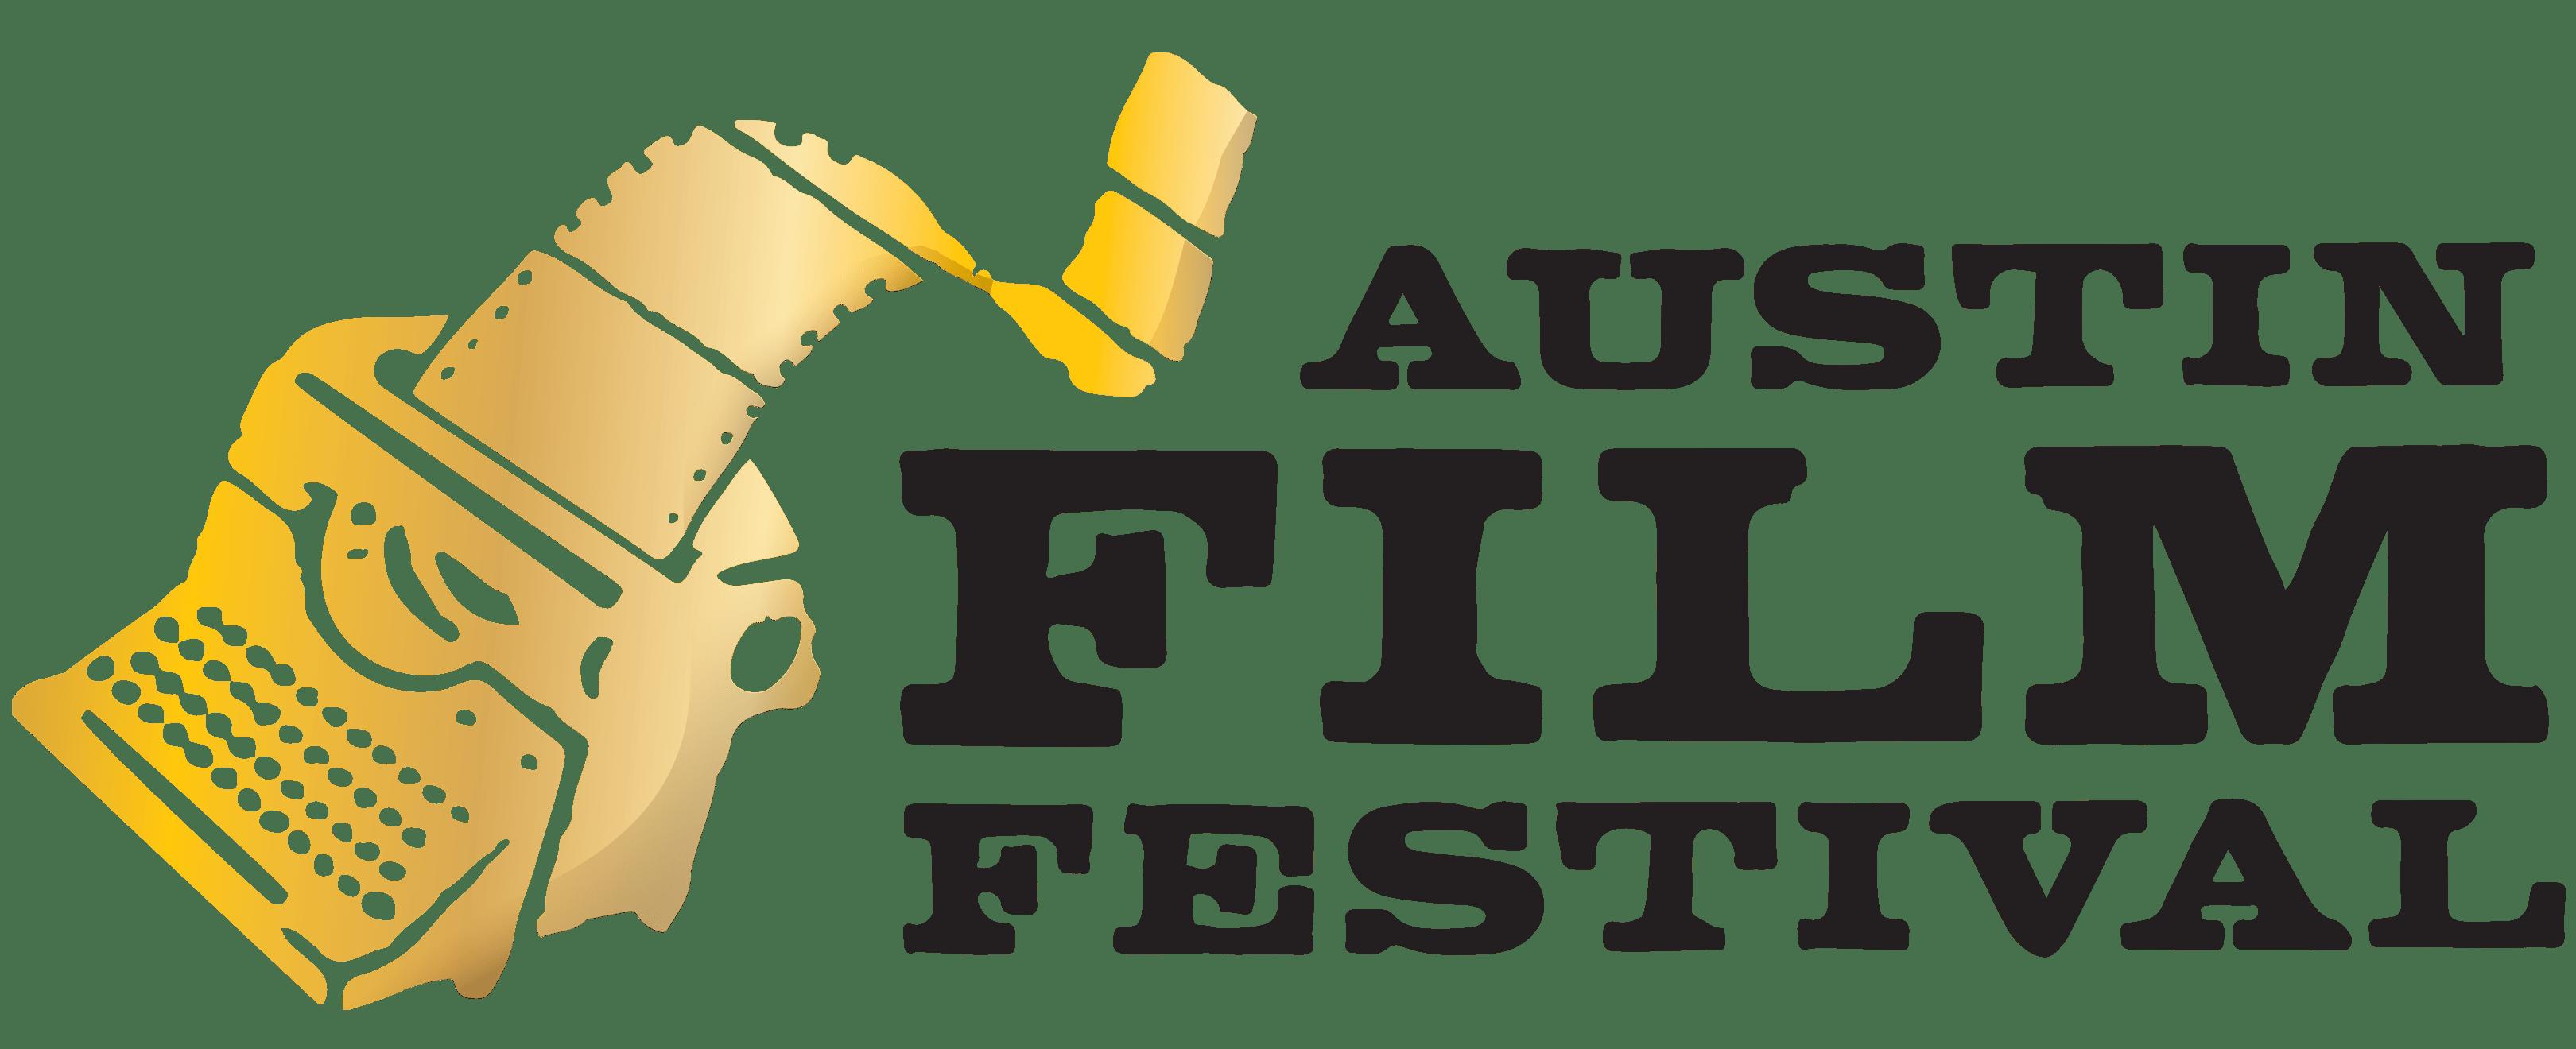 Festivals positive reviews deserved. Film clipart movie review